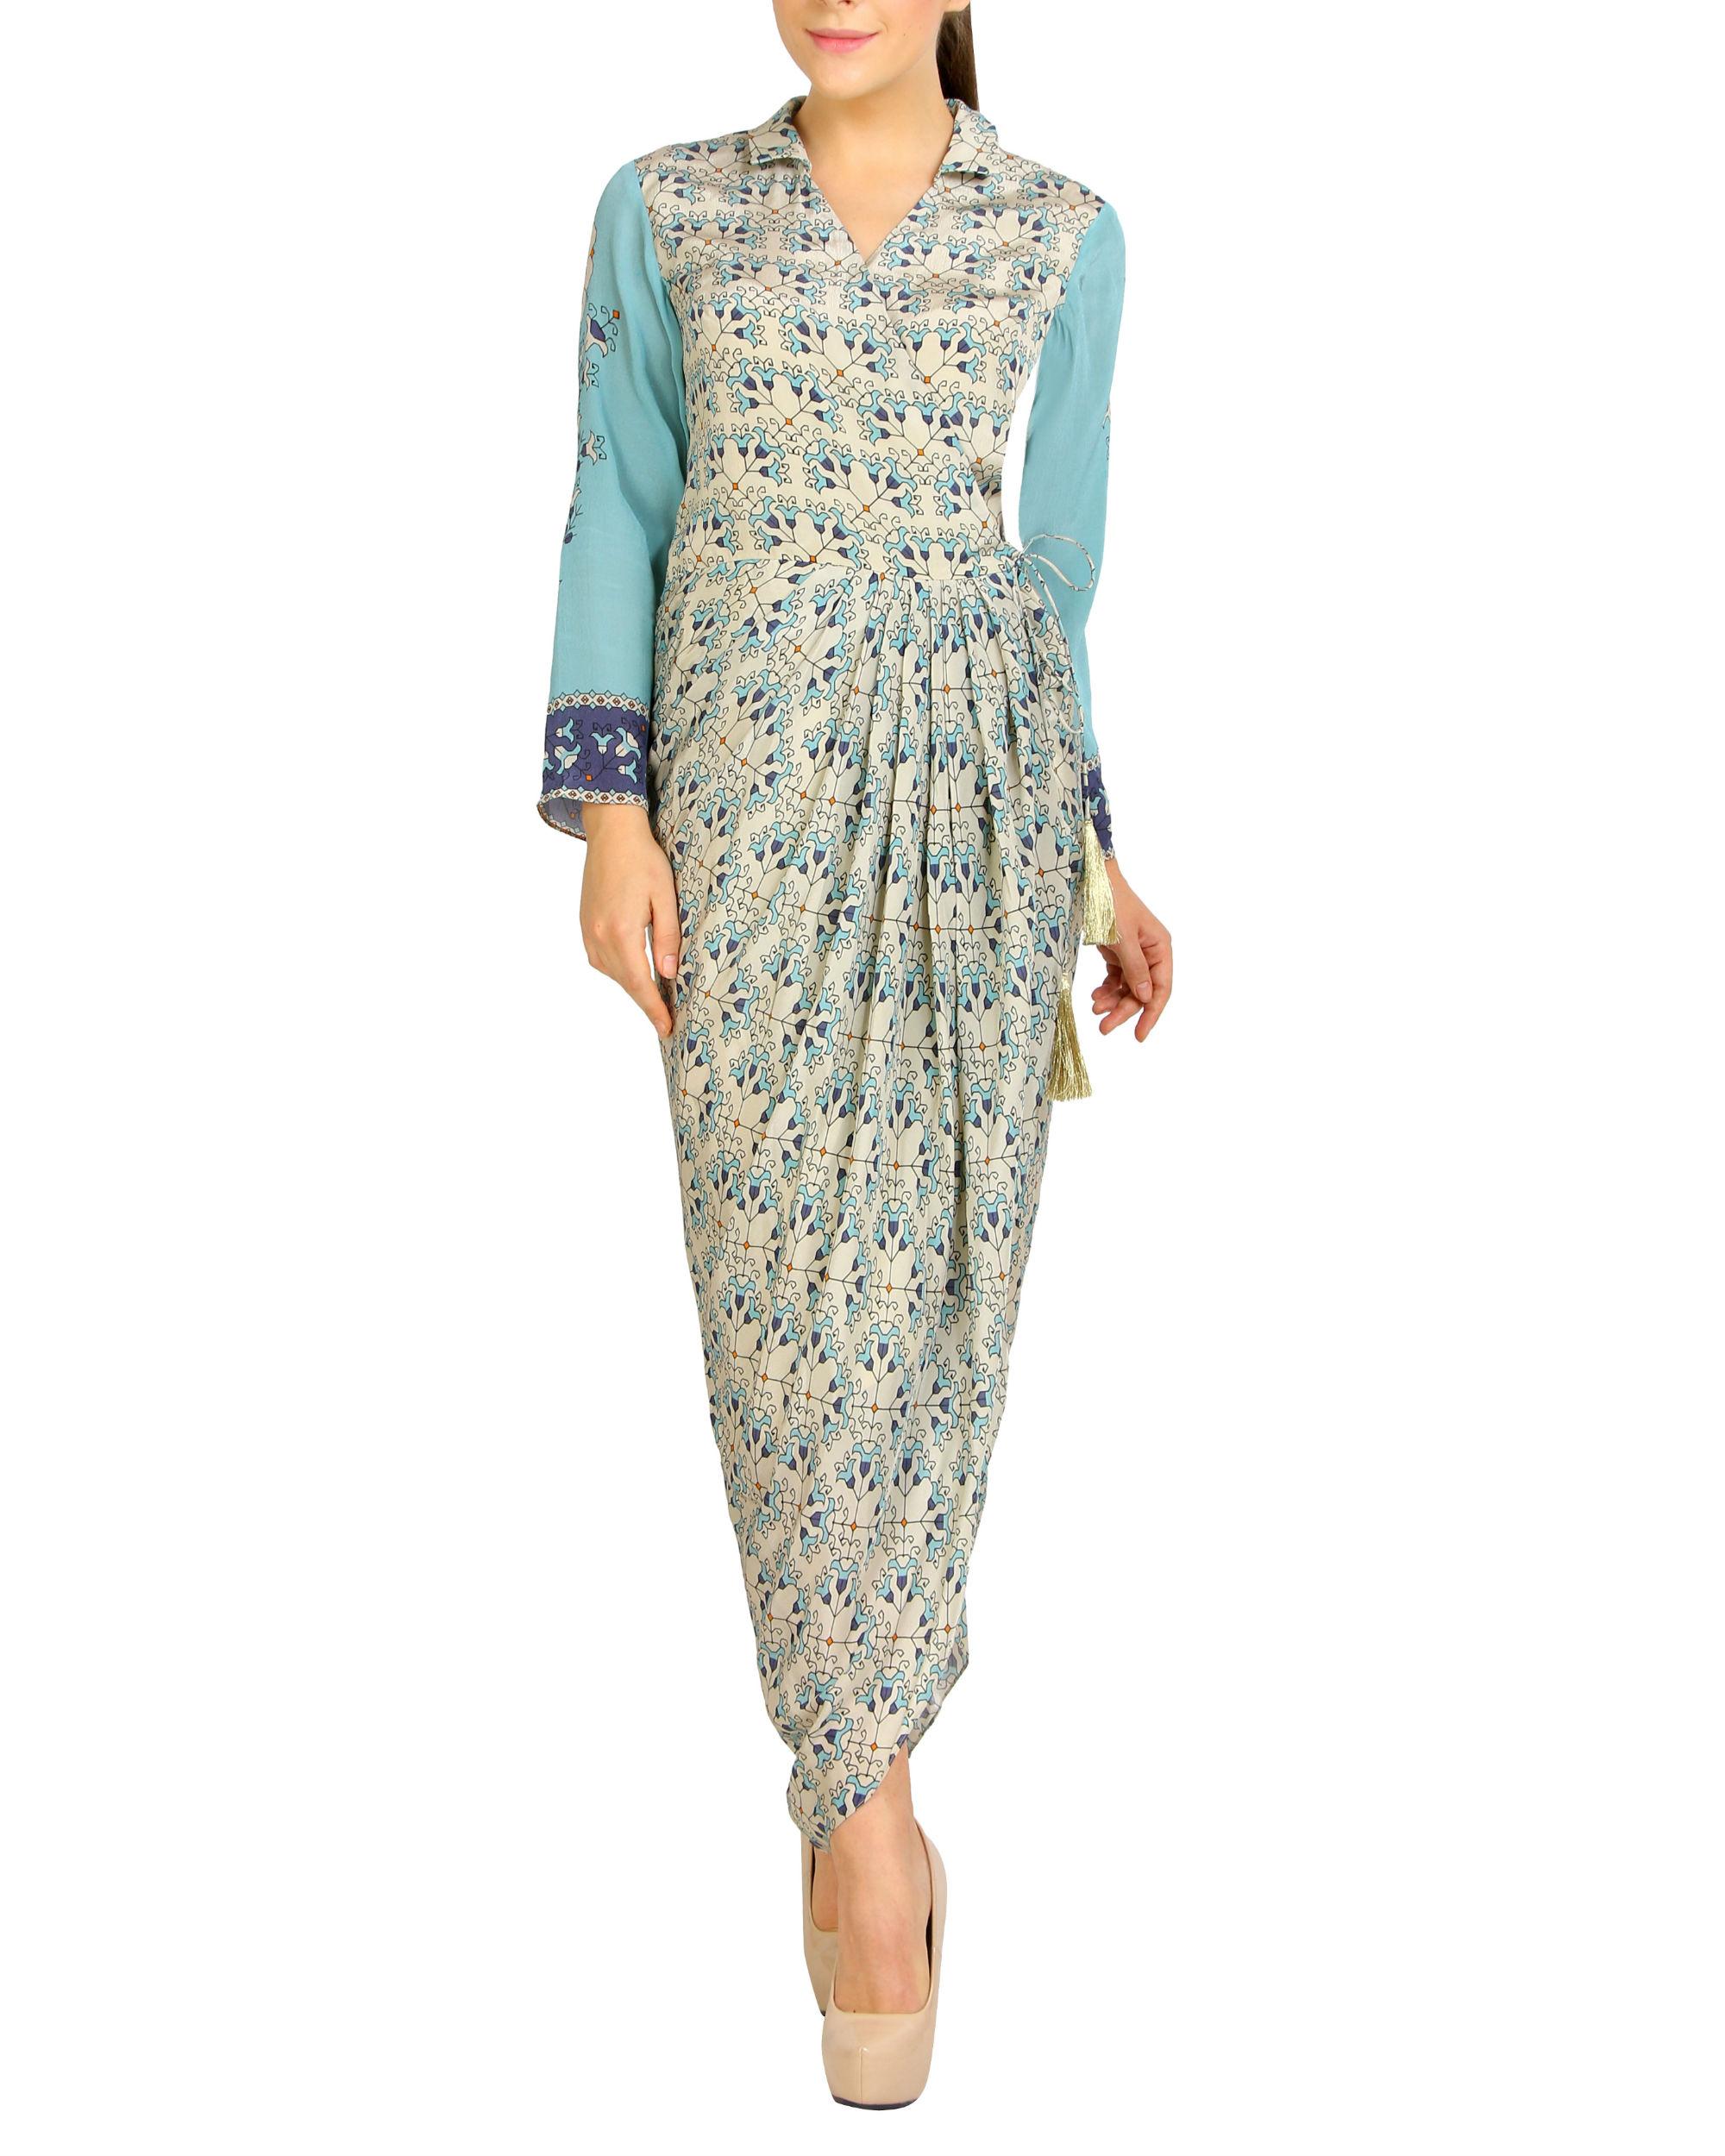 Off-white dhoti flap dress